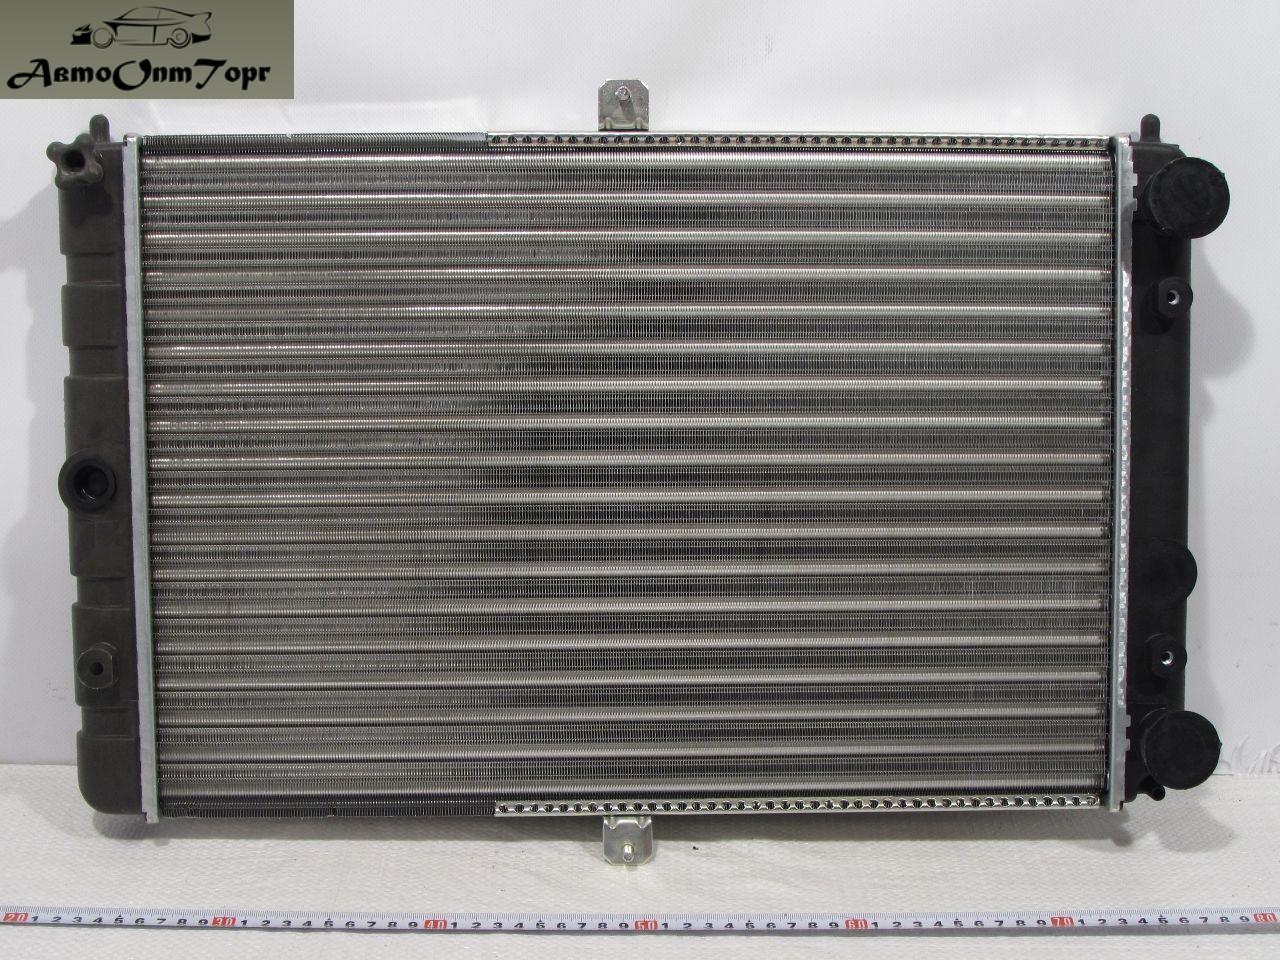 Радиатор охлаждения  ВАЗ 2108, 2109, 21099, Дааз, 2108-1301012